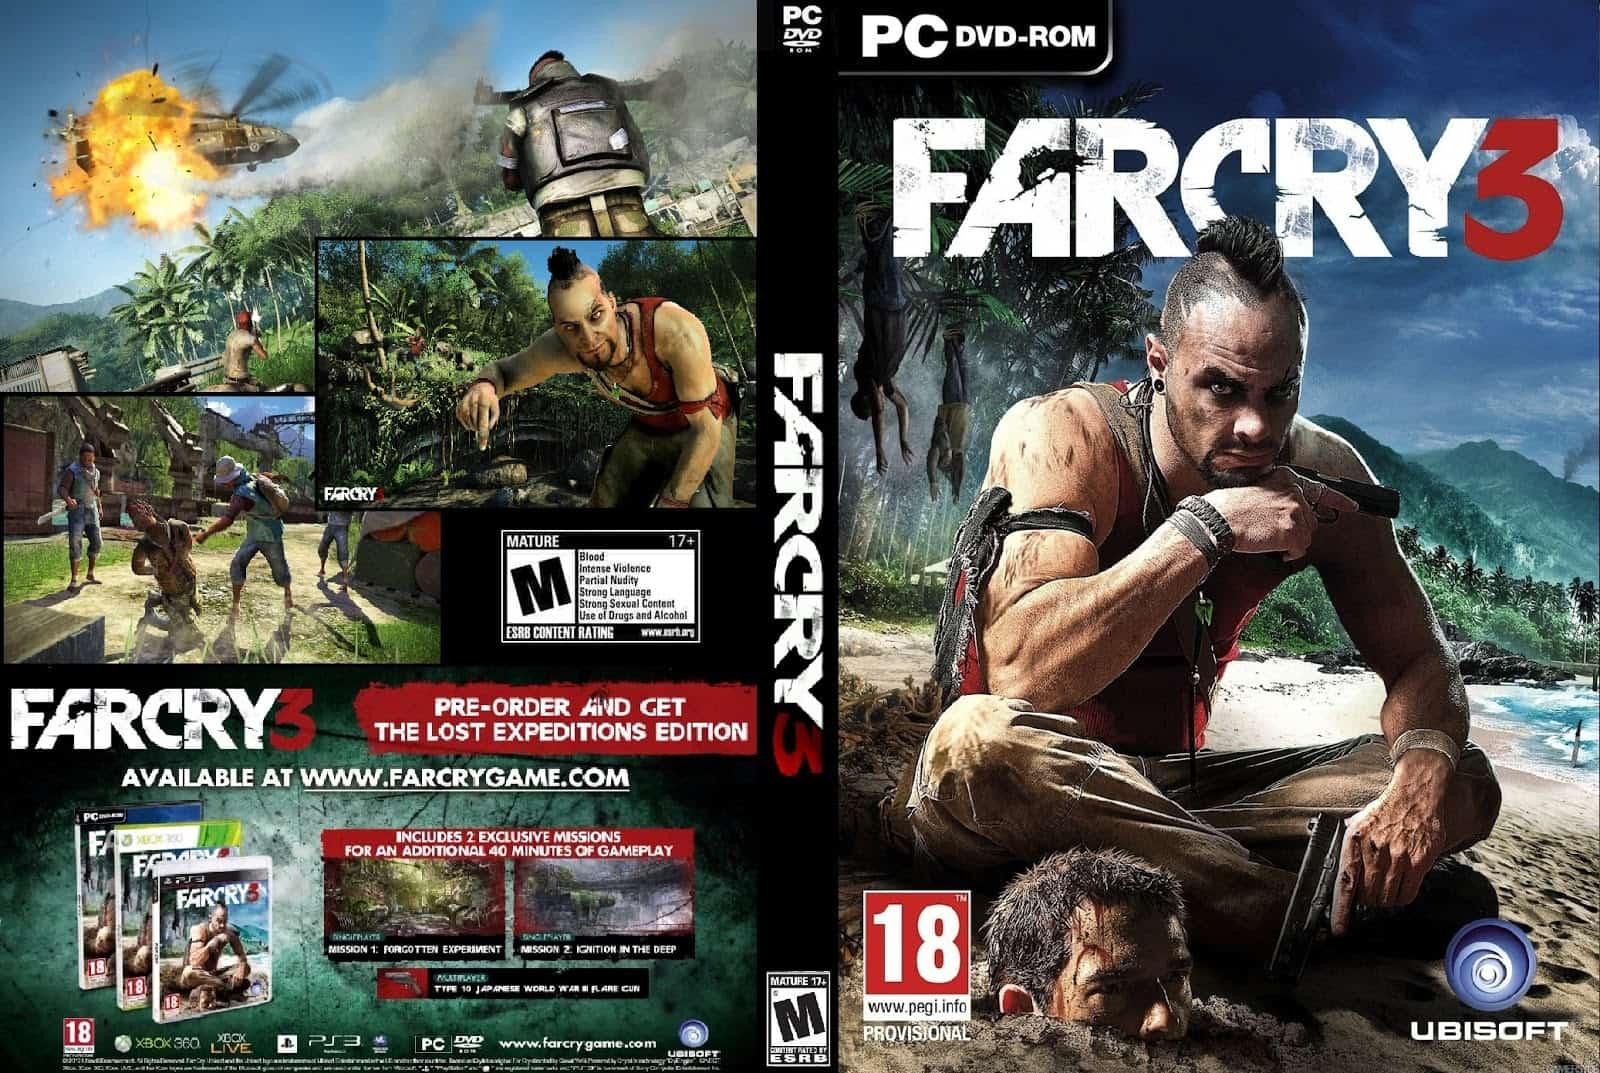 PC Far Cry 3 SaveGame (97%) - Save File Download